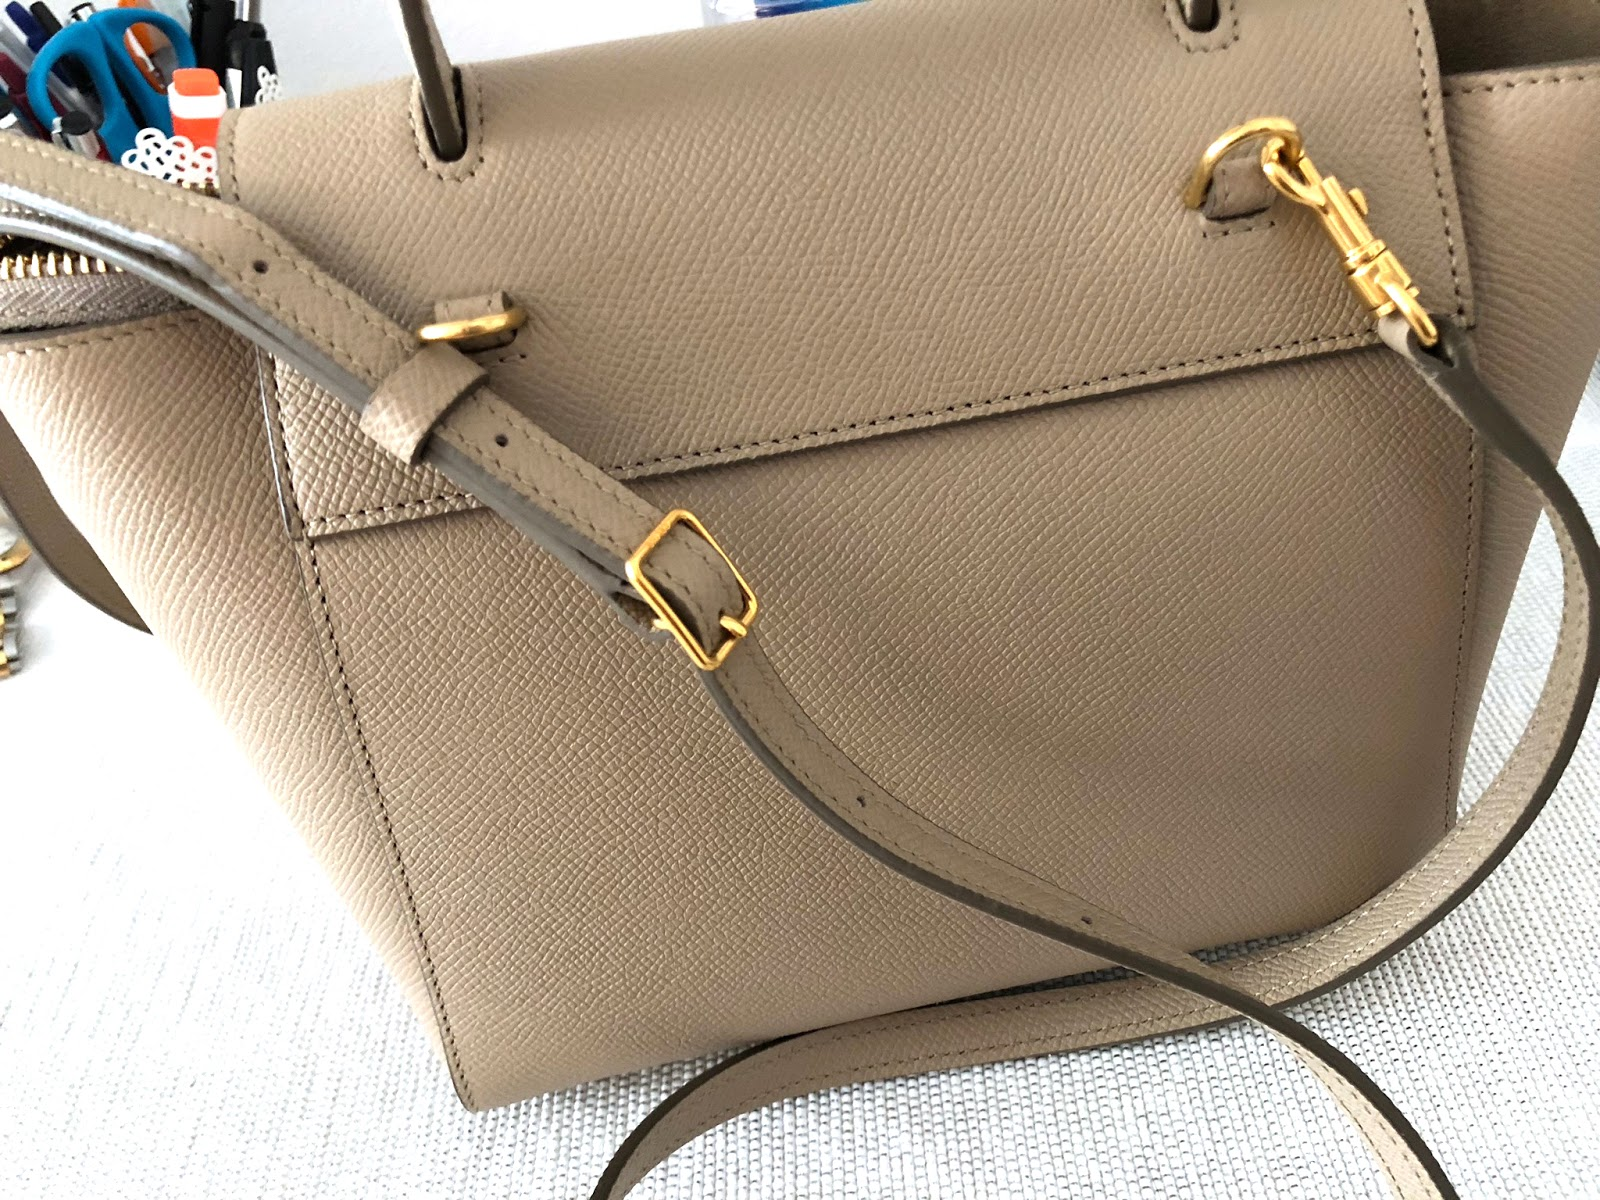 Celine Nano Belt Bag First Impression What Fits The Beauty